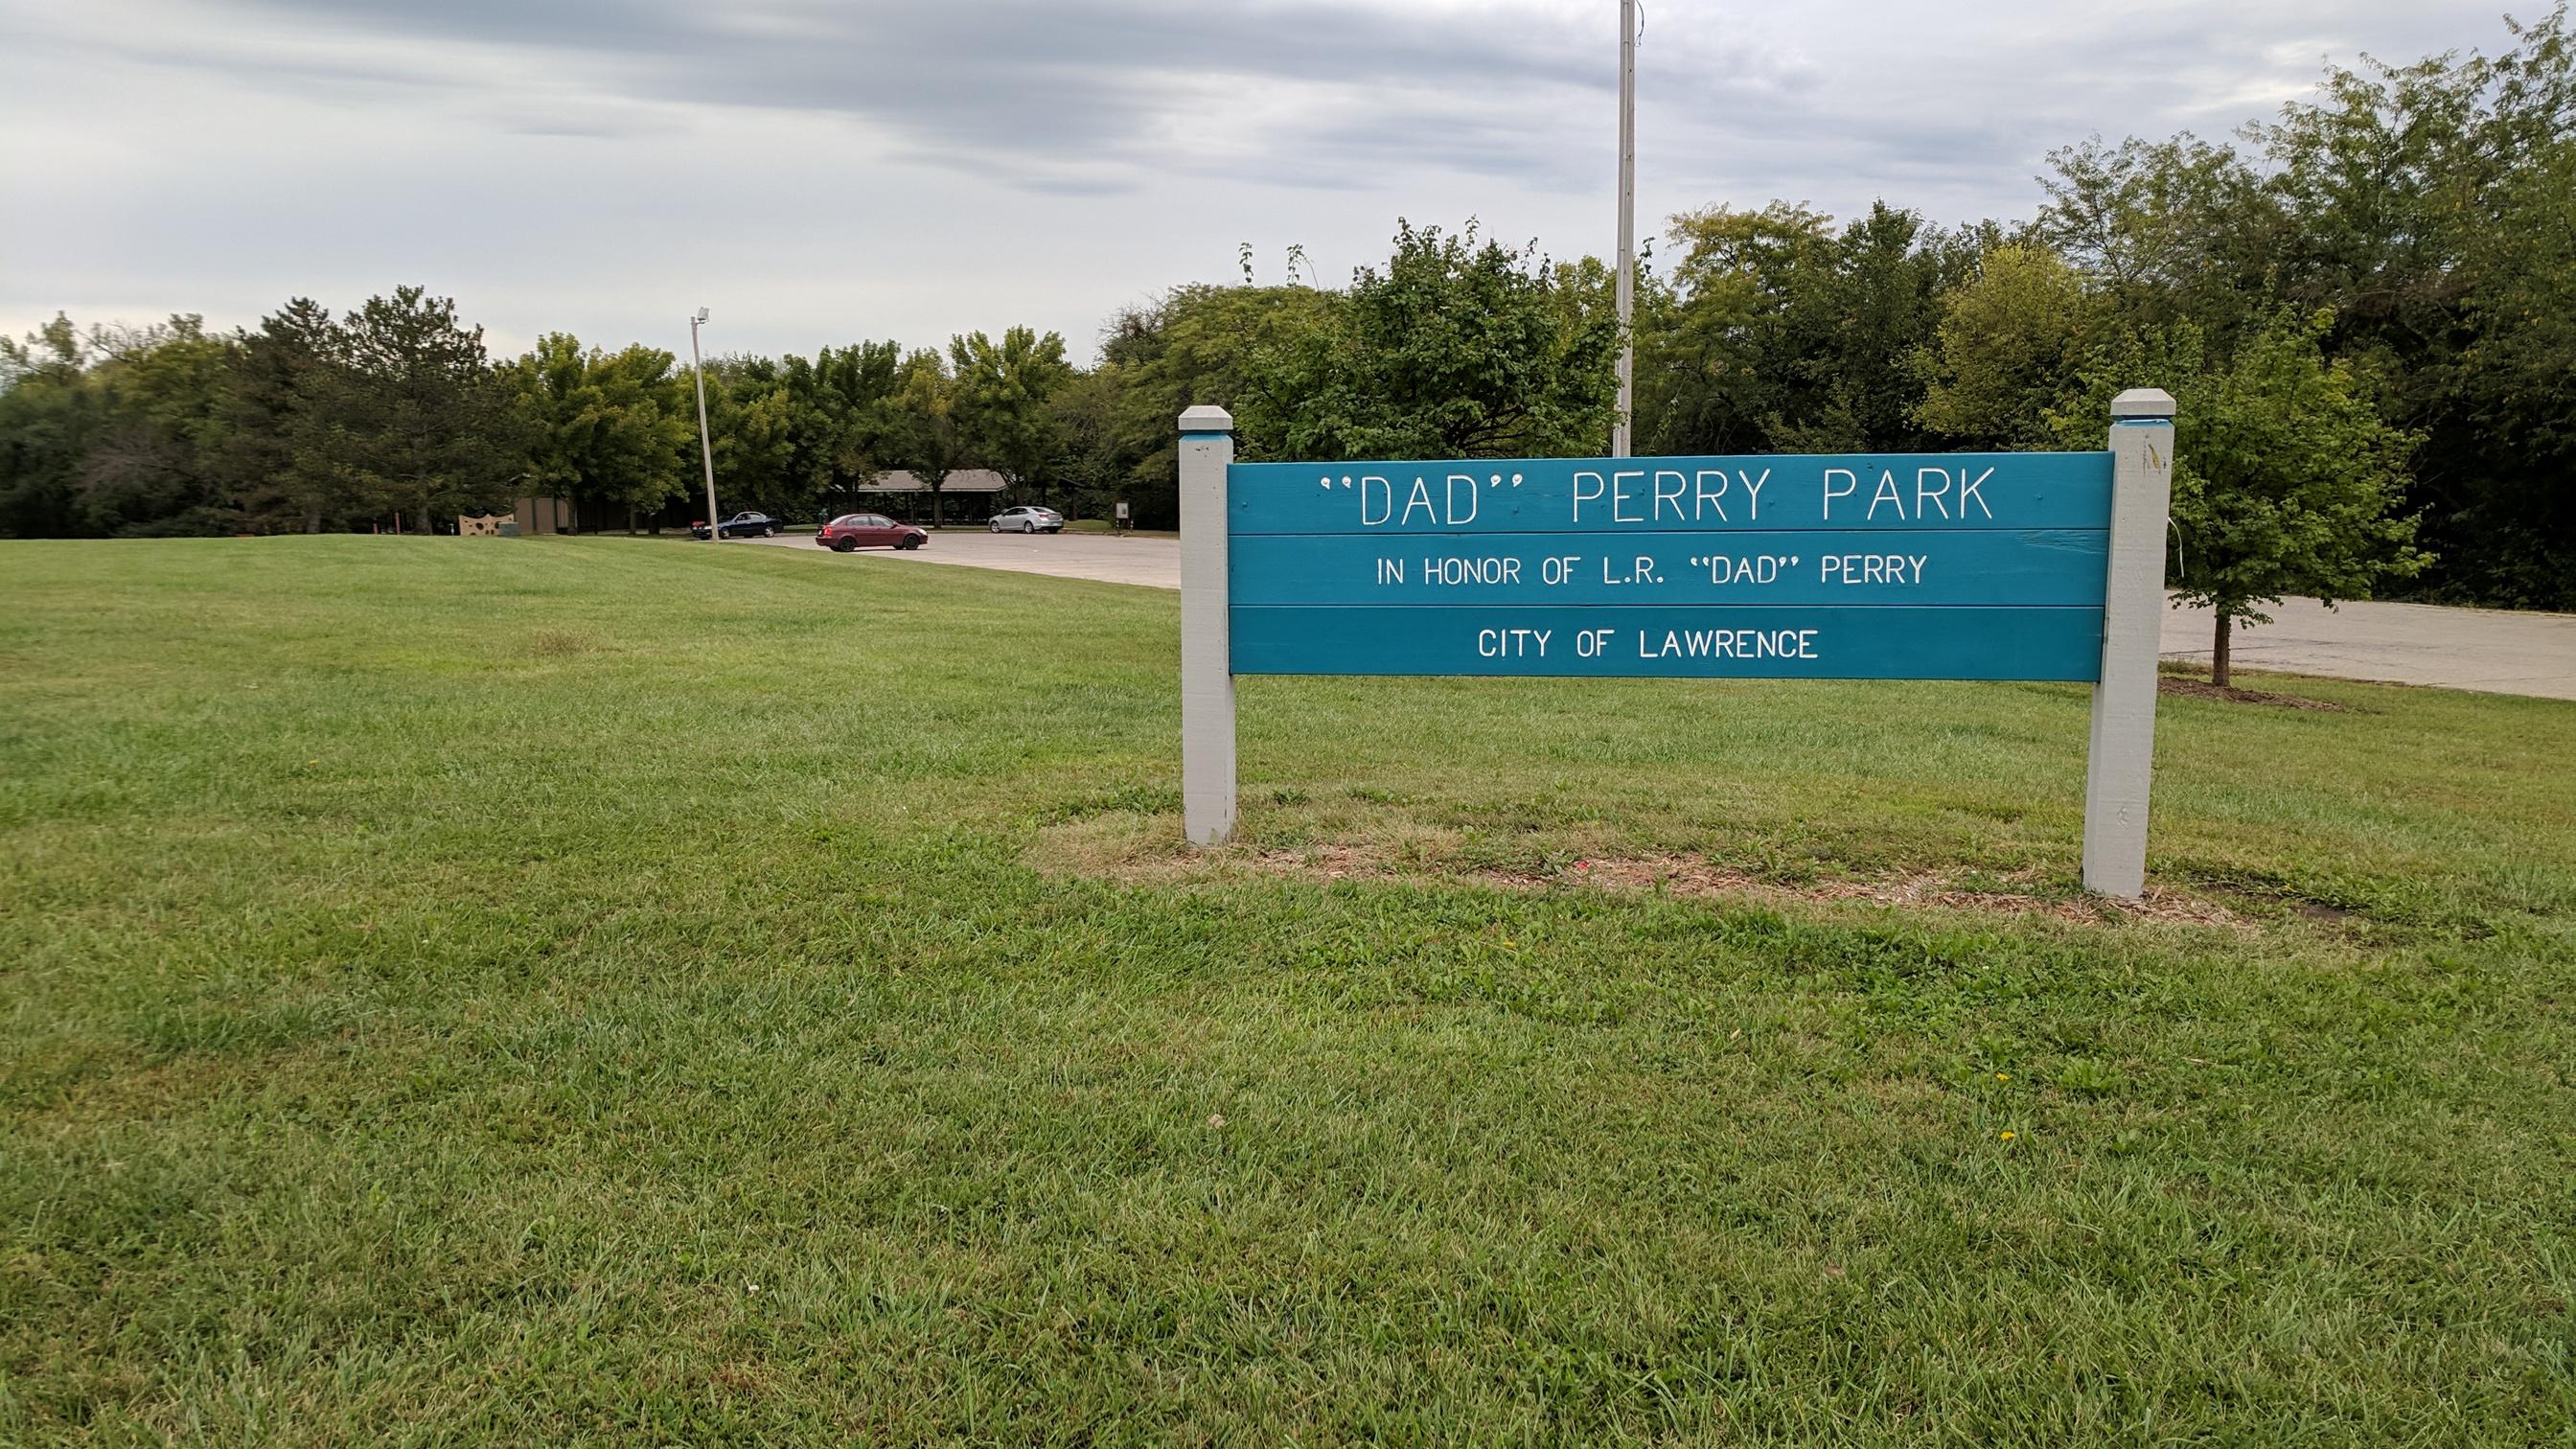 Dad Perry Park